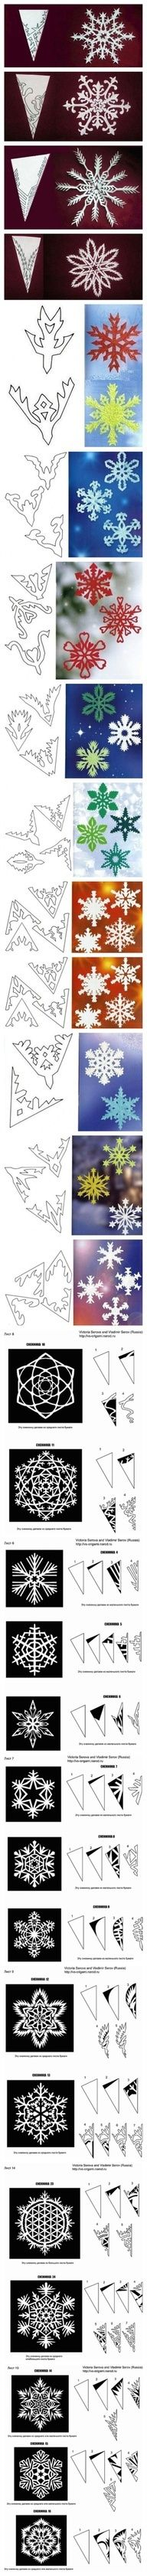 SNOWFLAKE TUTORIAL 2 Christine Van Patter / Pinterest  pinterest.com